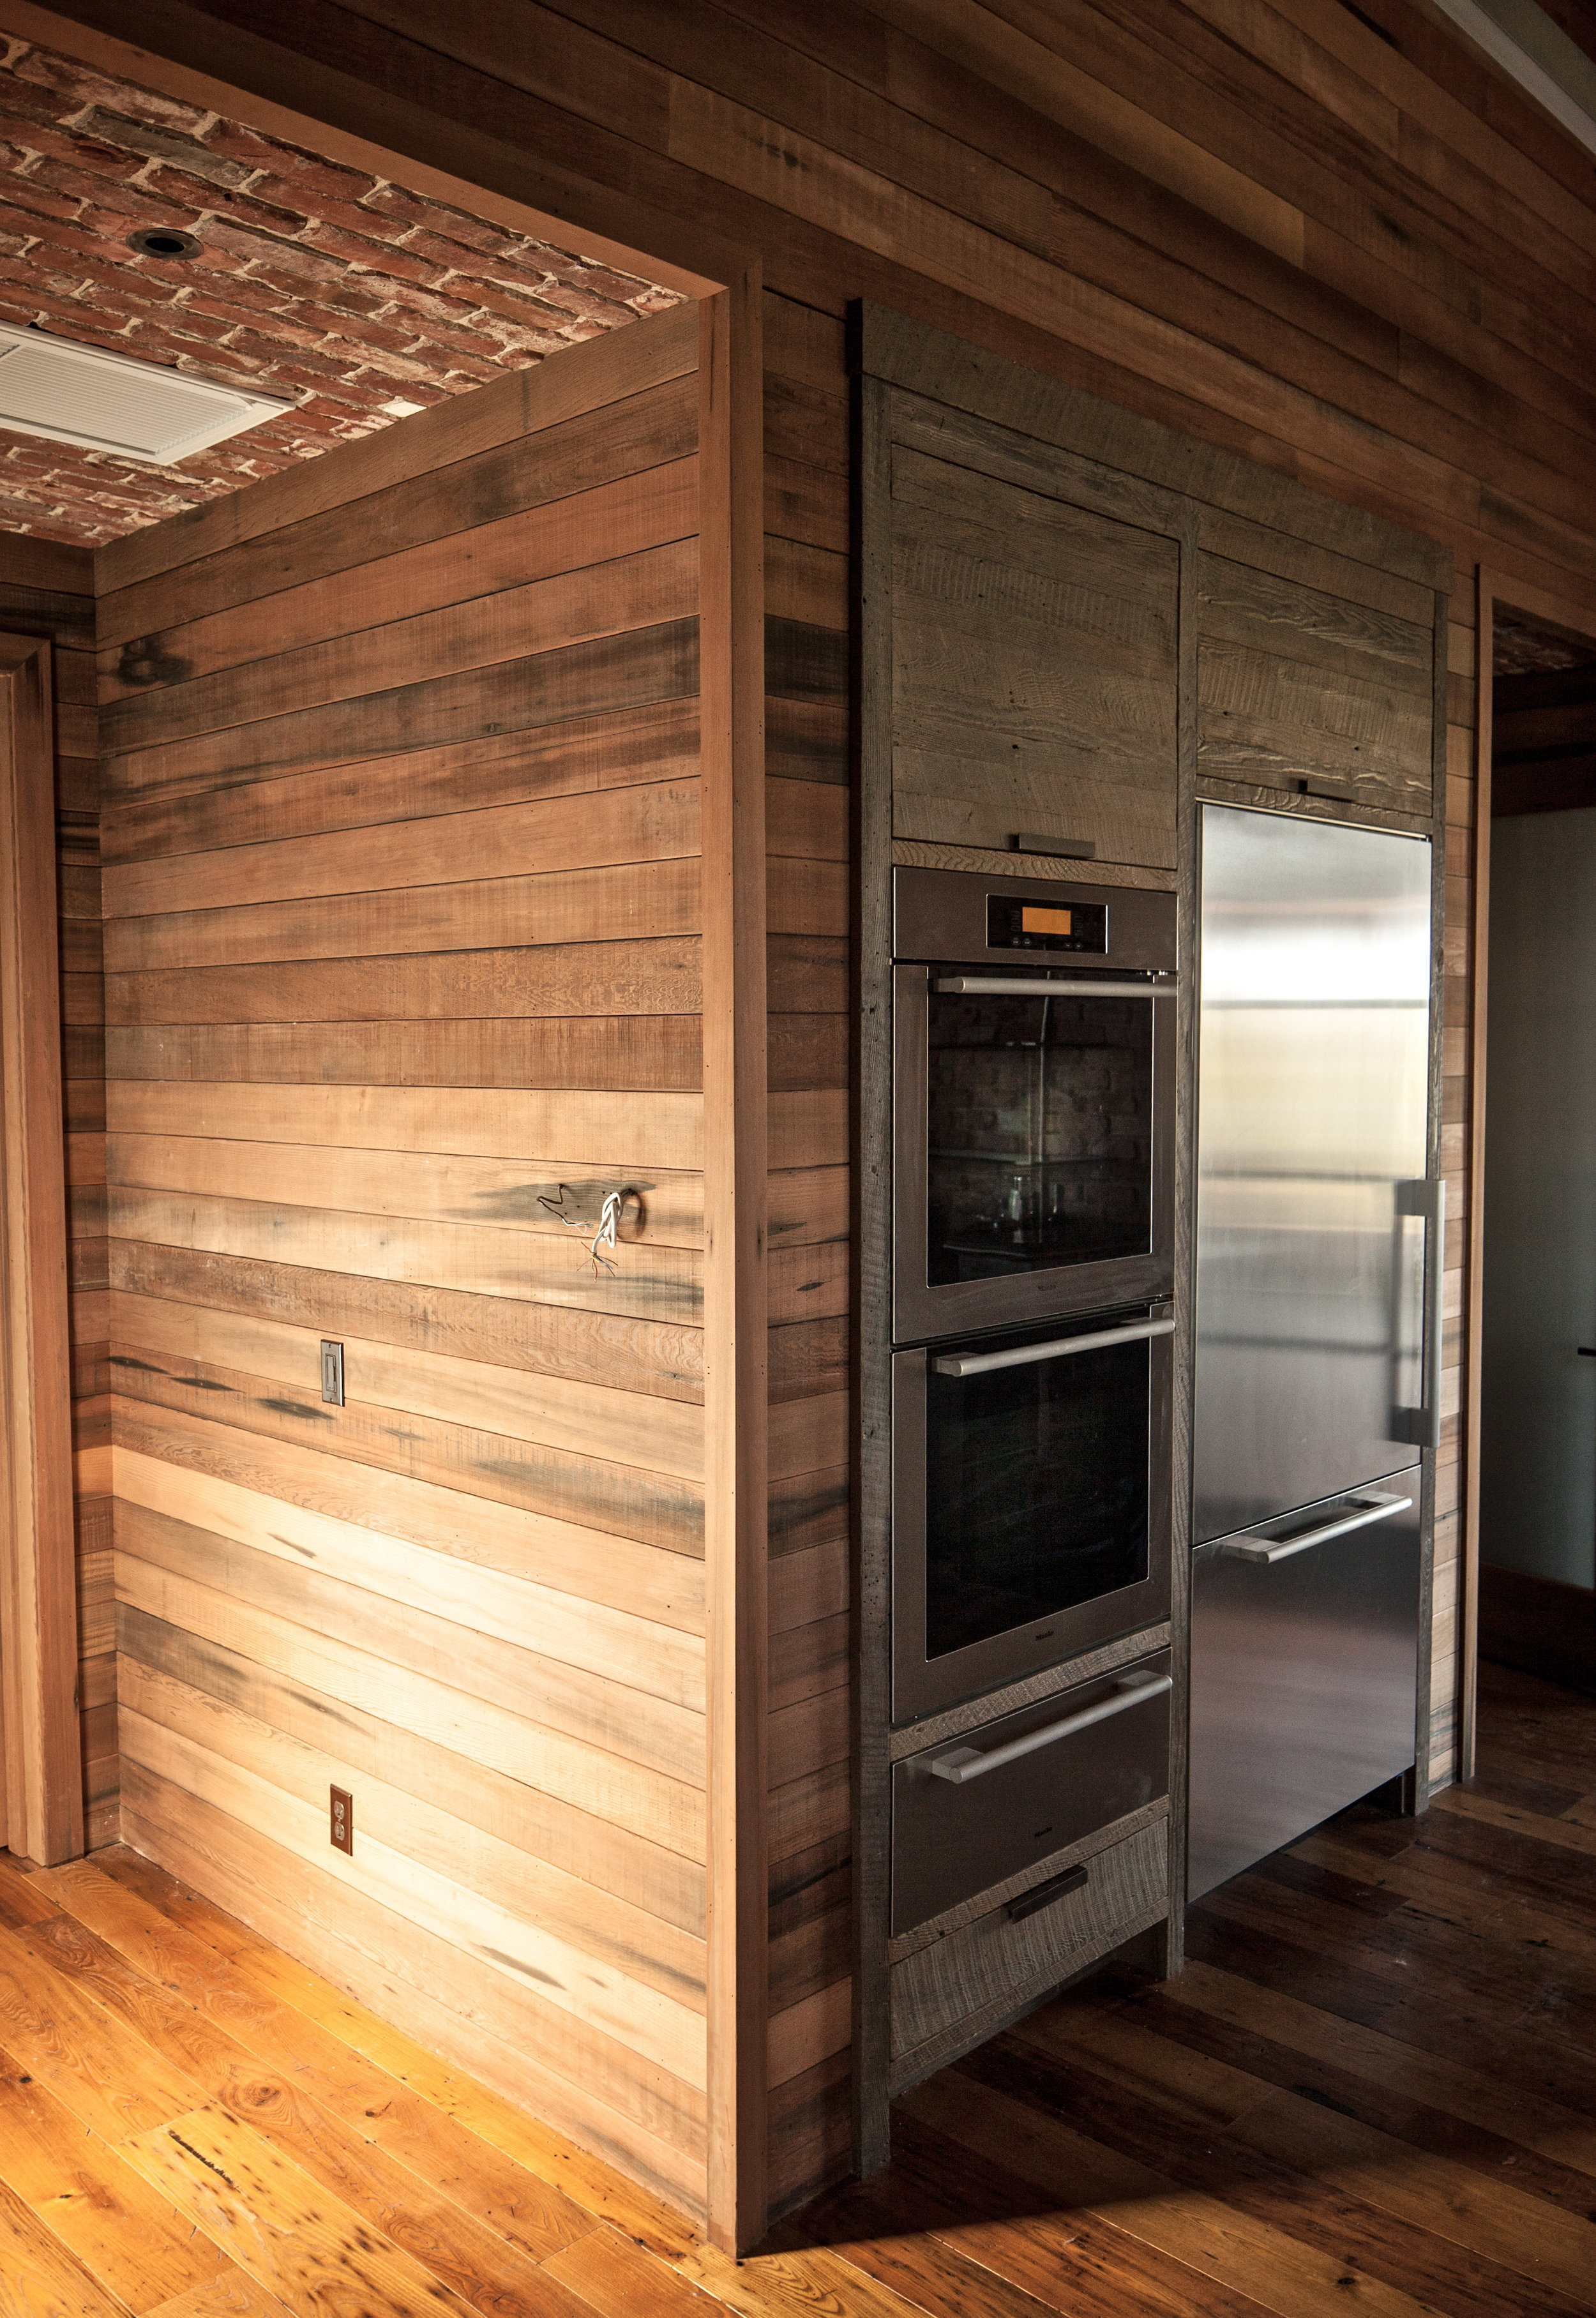 ben-riddering-rustic-modern-kitchen-9.jpg